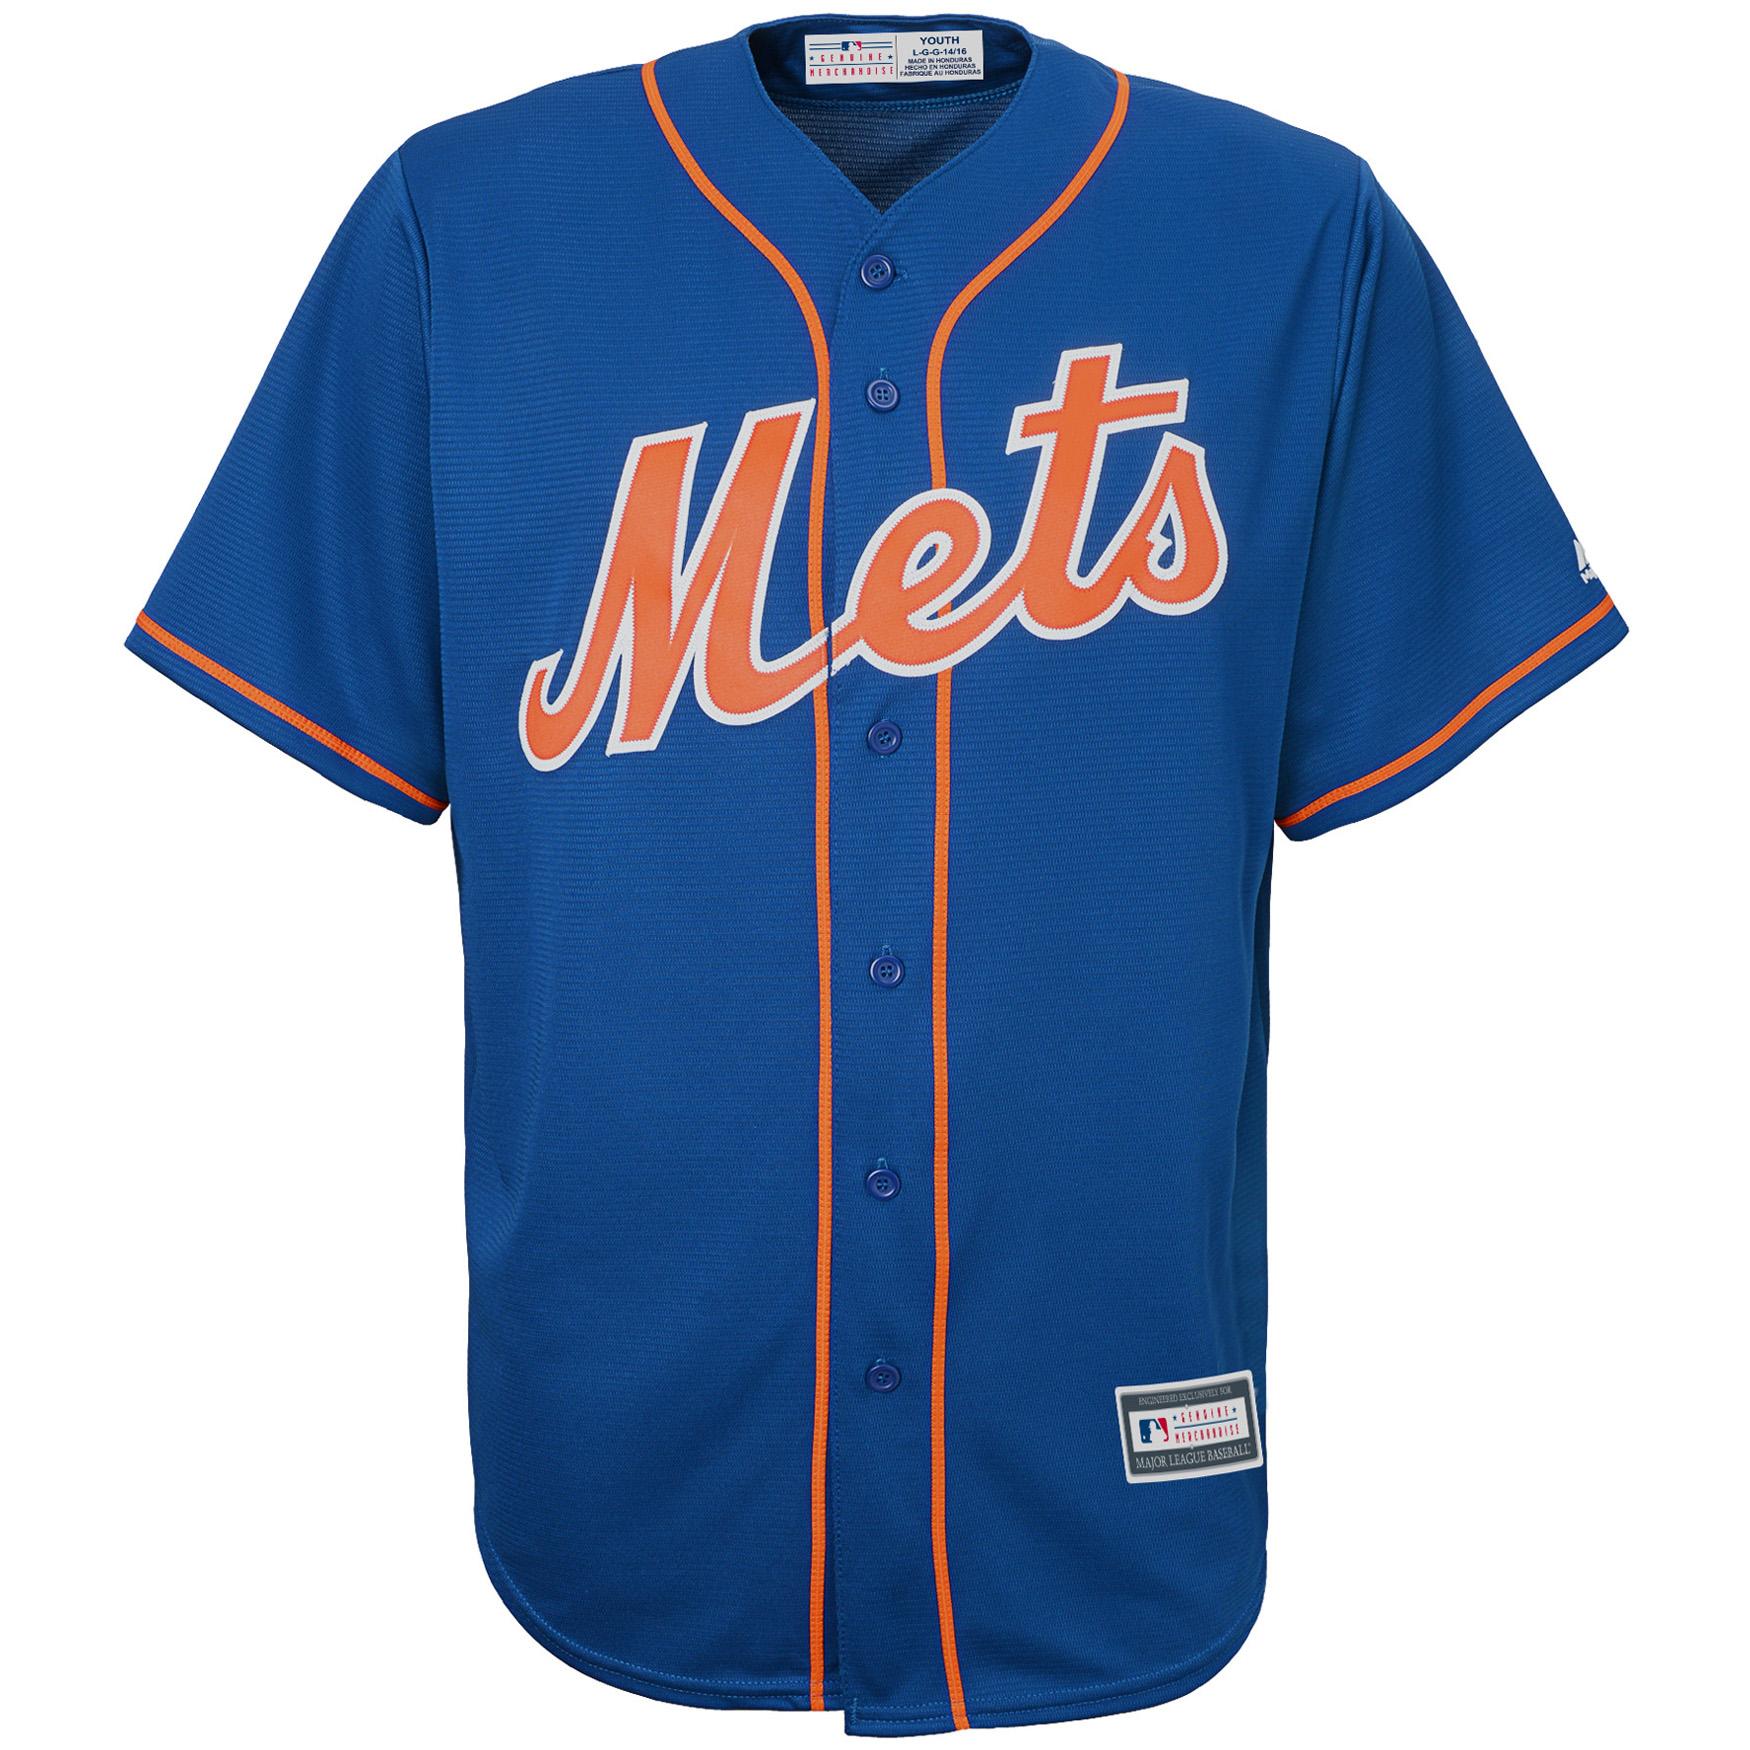 uk availability b8001 83f02 New York Mets Youth Alternate Replica Blank Team Jersey - Royal